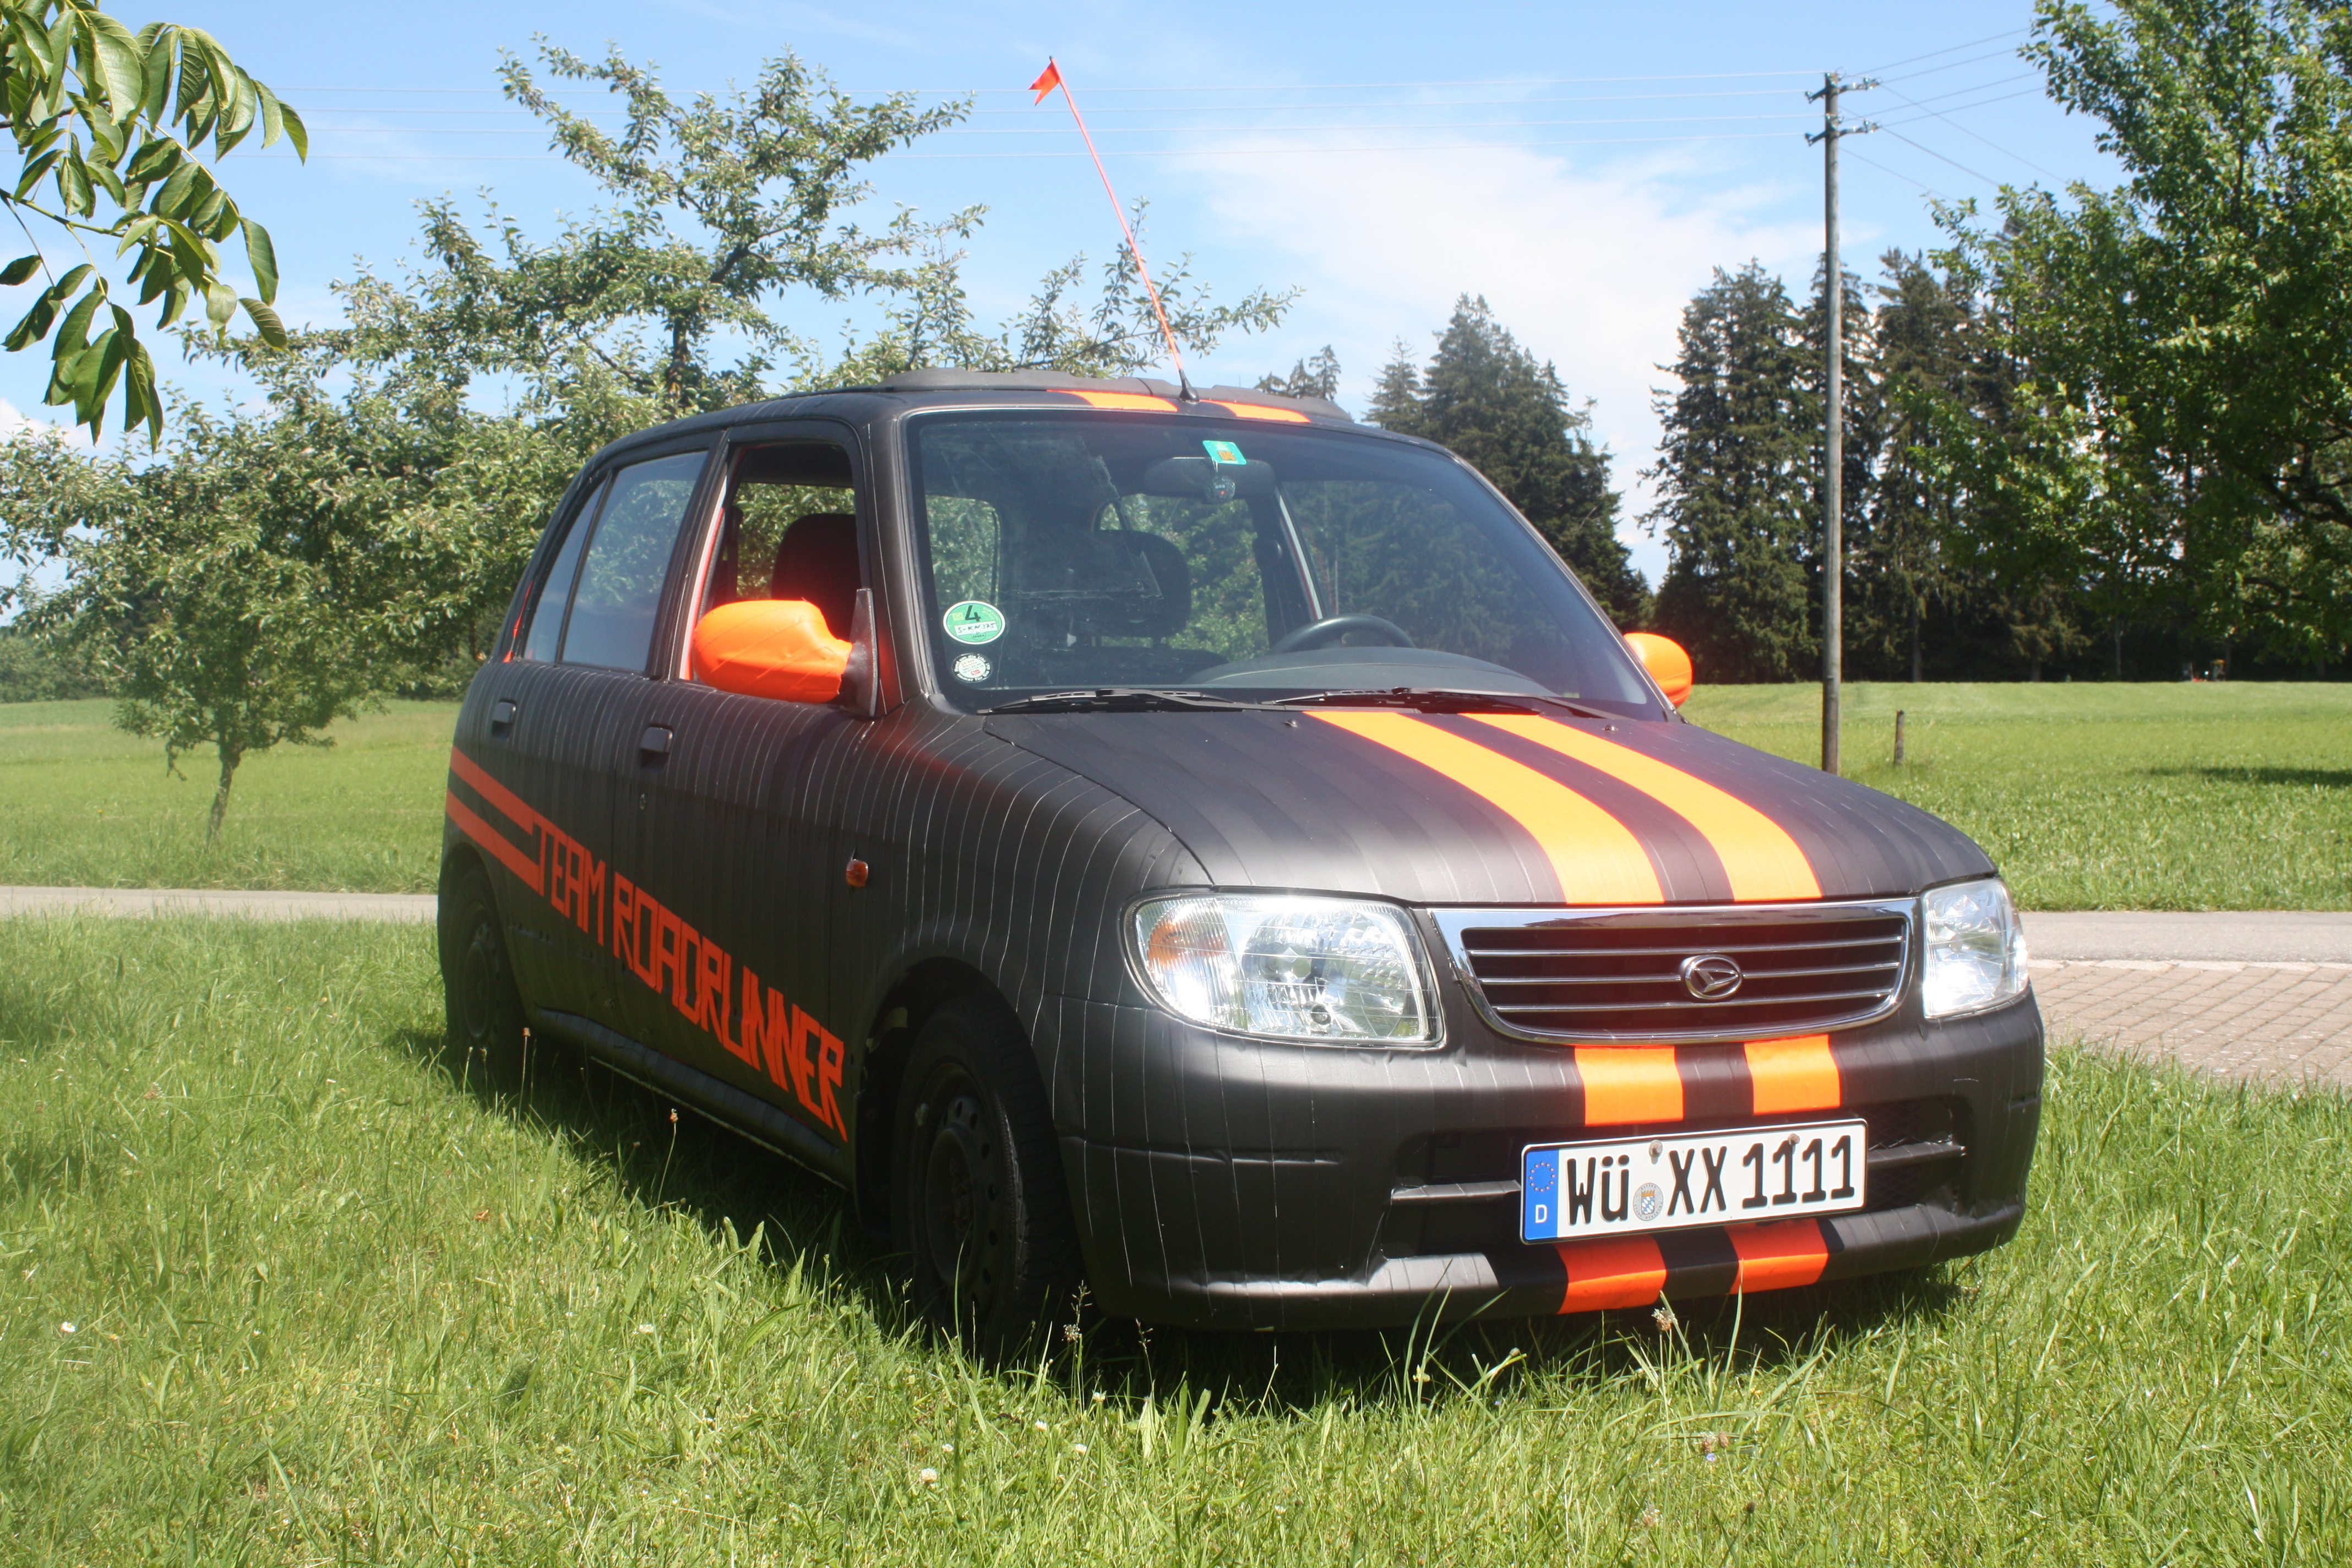 unser fahrzeug mongol rally 2011 team roadrunner. Black Bedroom Furniture Sets. Home Design Ideas